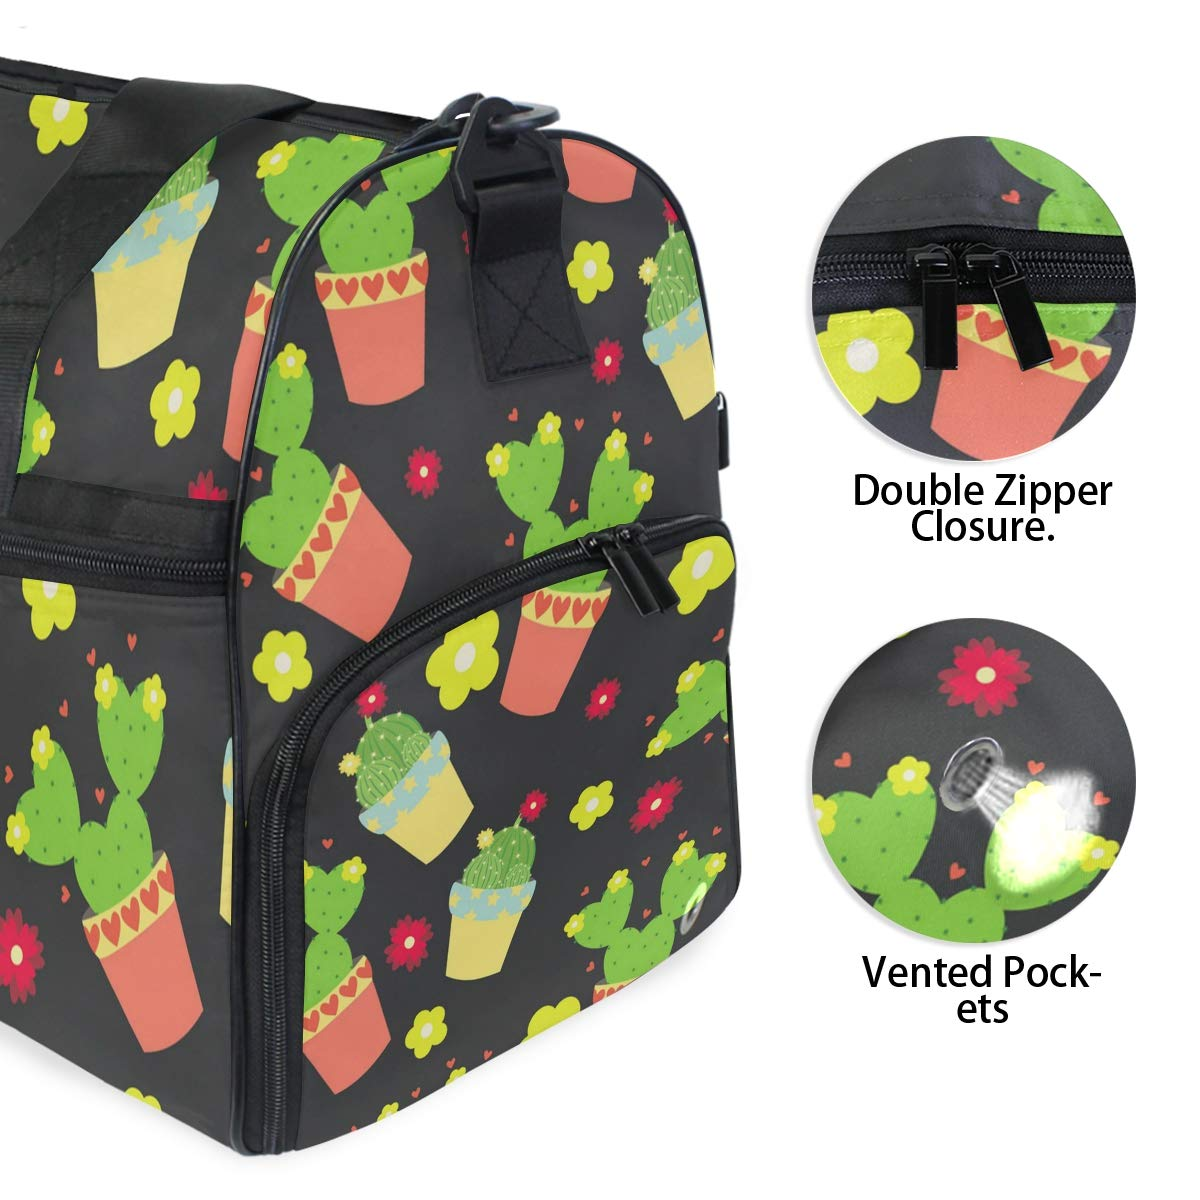 Black Flower Colorful Cactus Large Travel Duffel Bag For Women Men Overnight Weekend Lightweight Luggage Bag